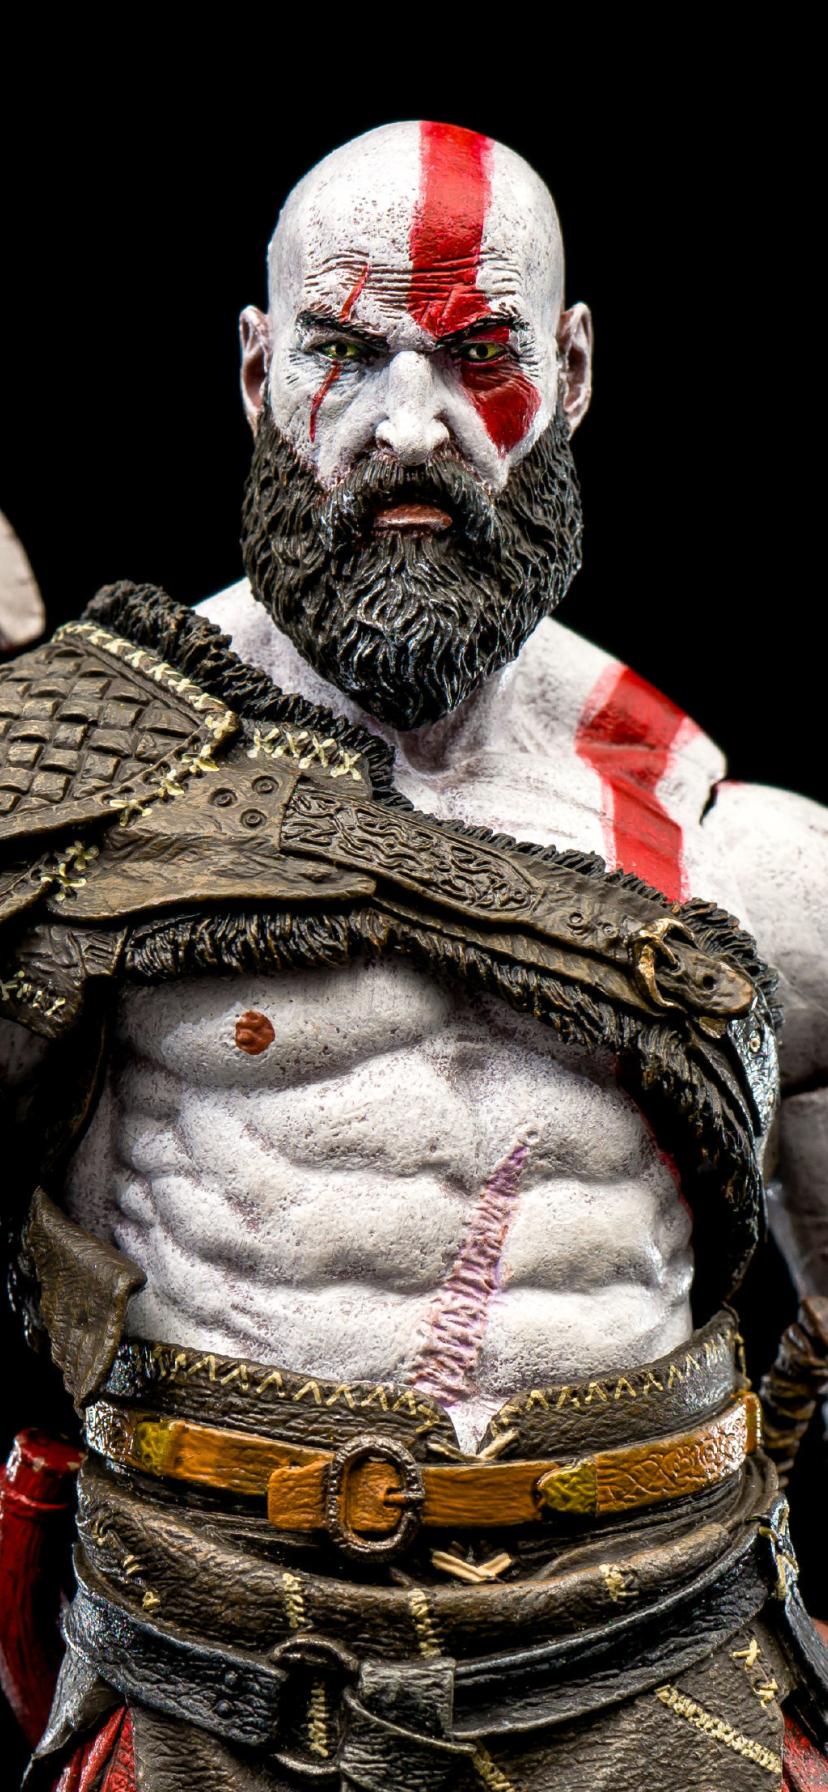 828x1792 Kratos God Of War 2018 828x1792 Resolution